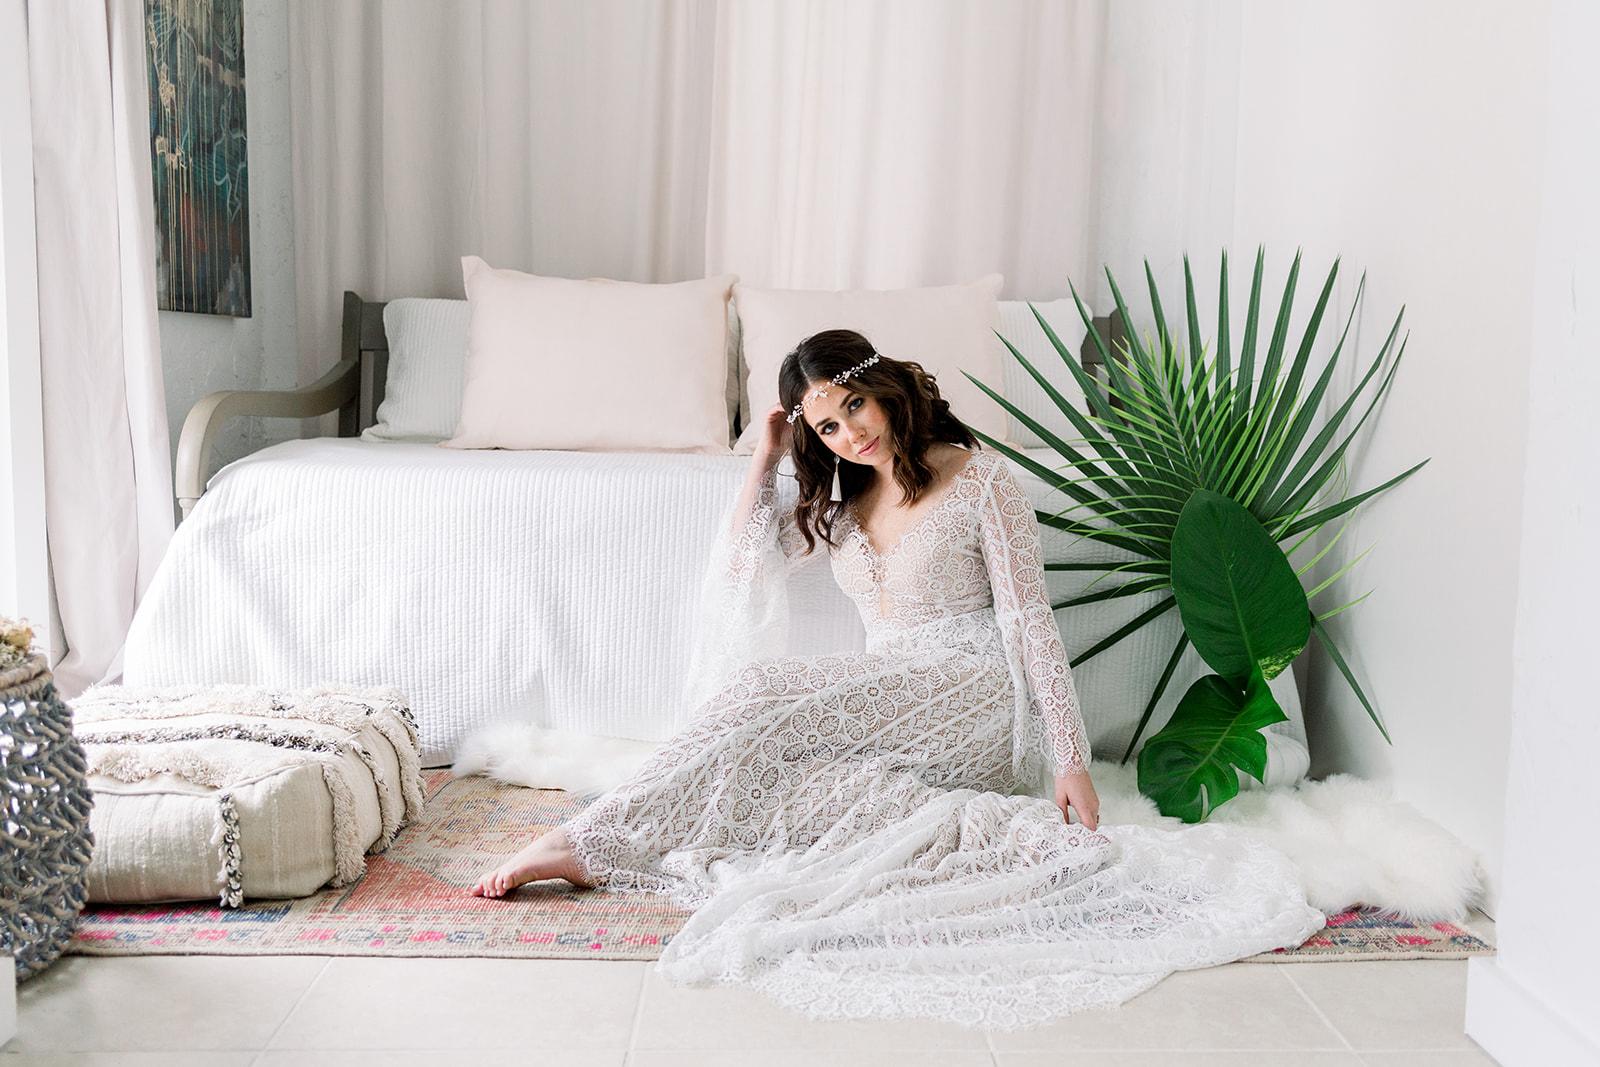 champagneaandgrit bridal accessories, wedding accessories, bridal halo, modern bride.jpg